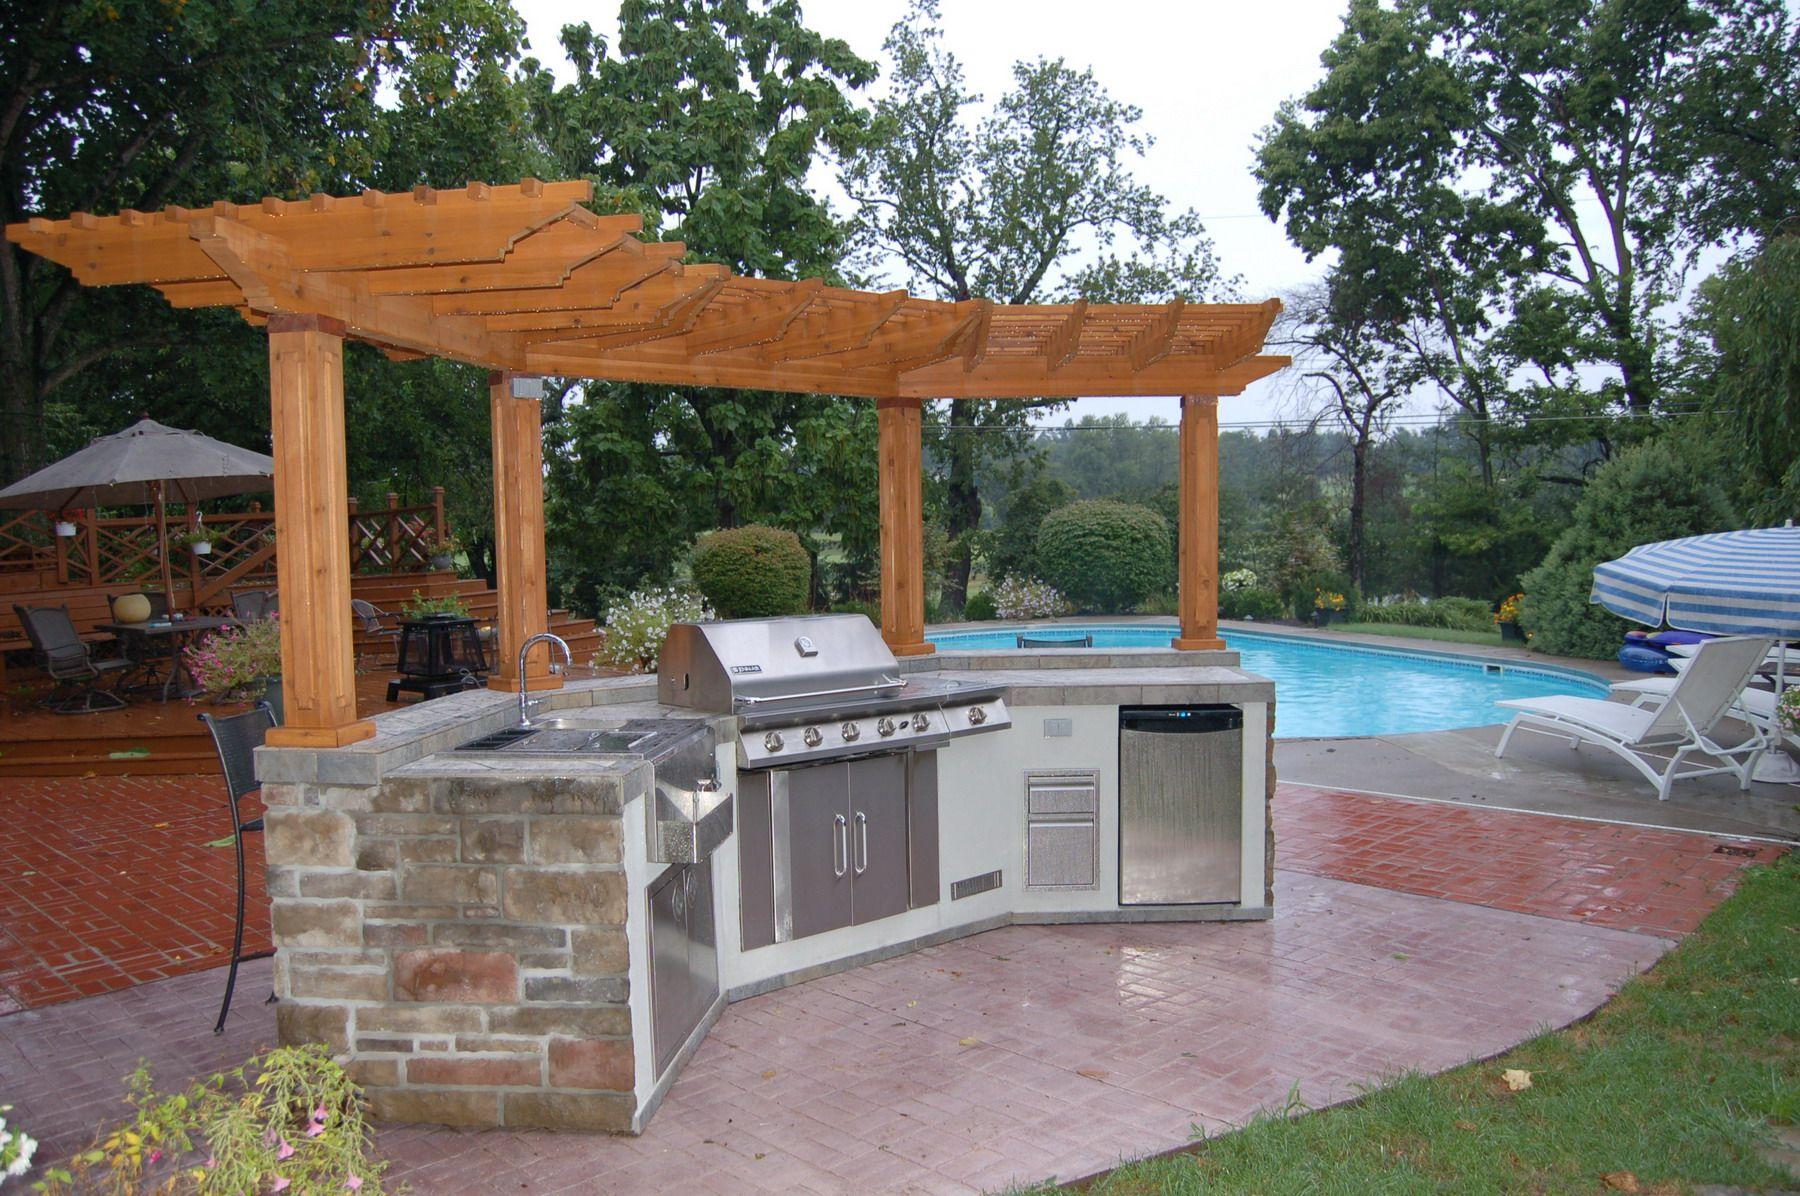 San Antonio Outdoor Kitchens Installation Amp Design Outdoor Kitchen Design Outdoor Kitchen Island Outdoor Kitchen